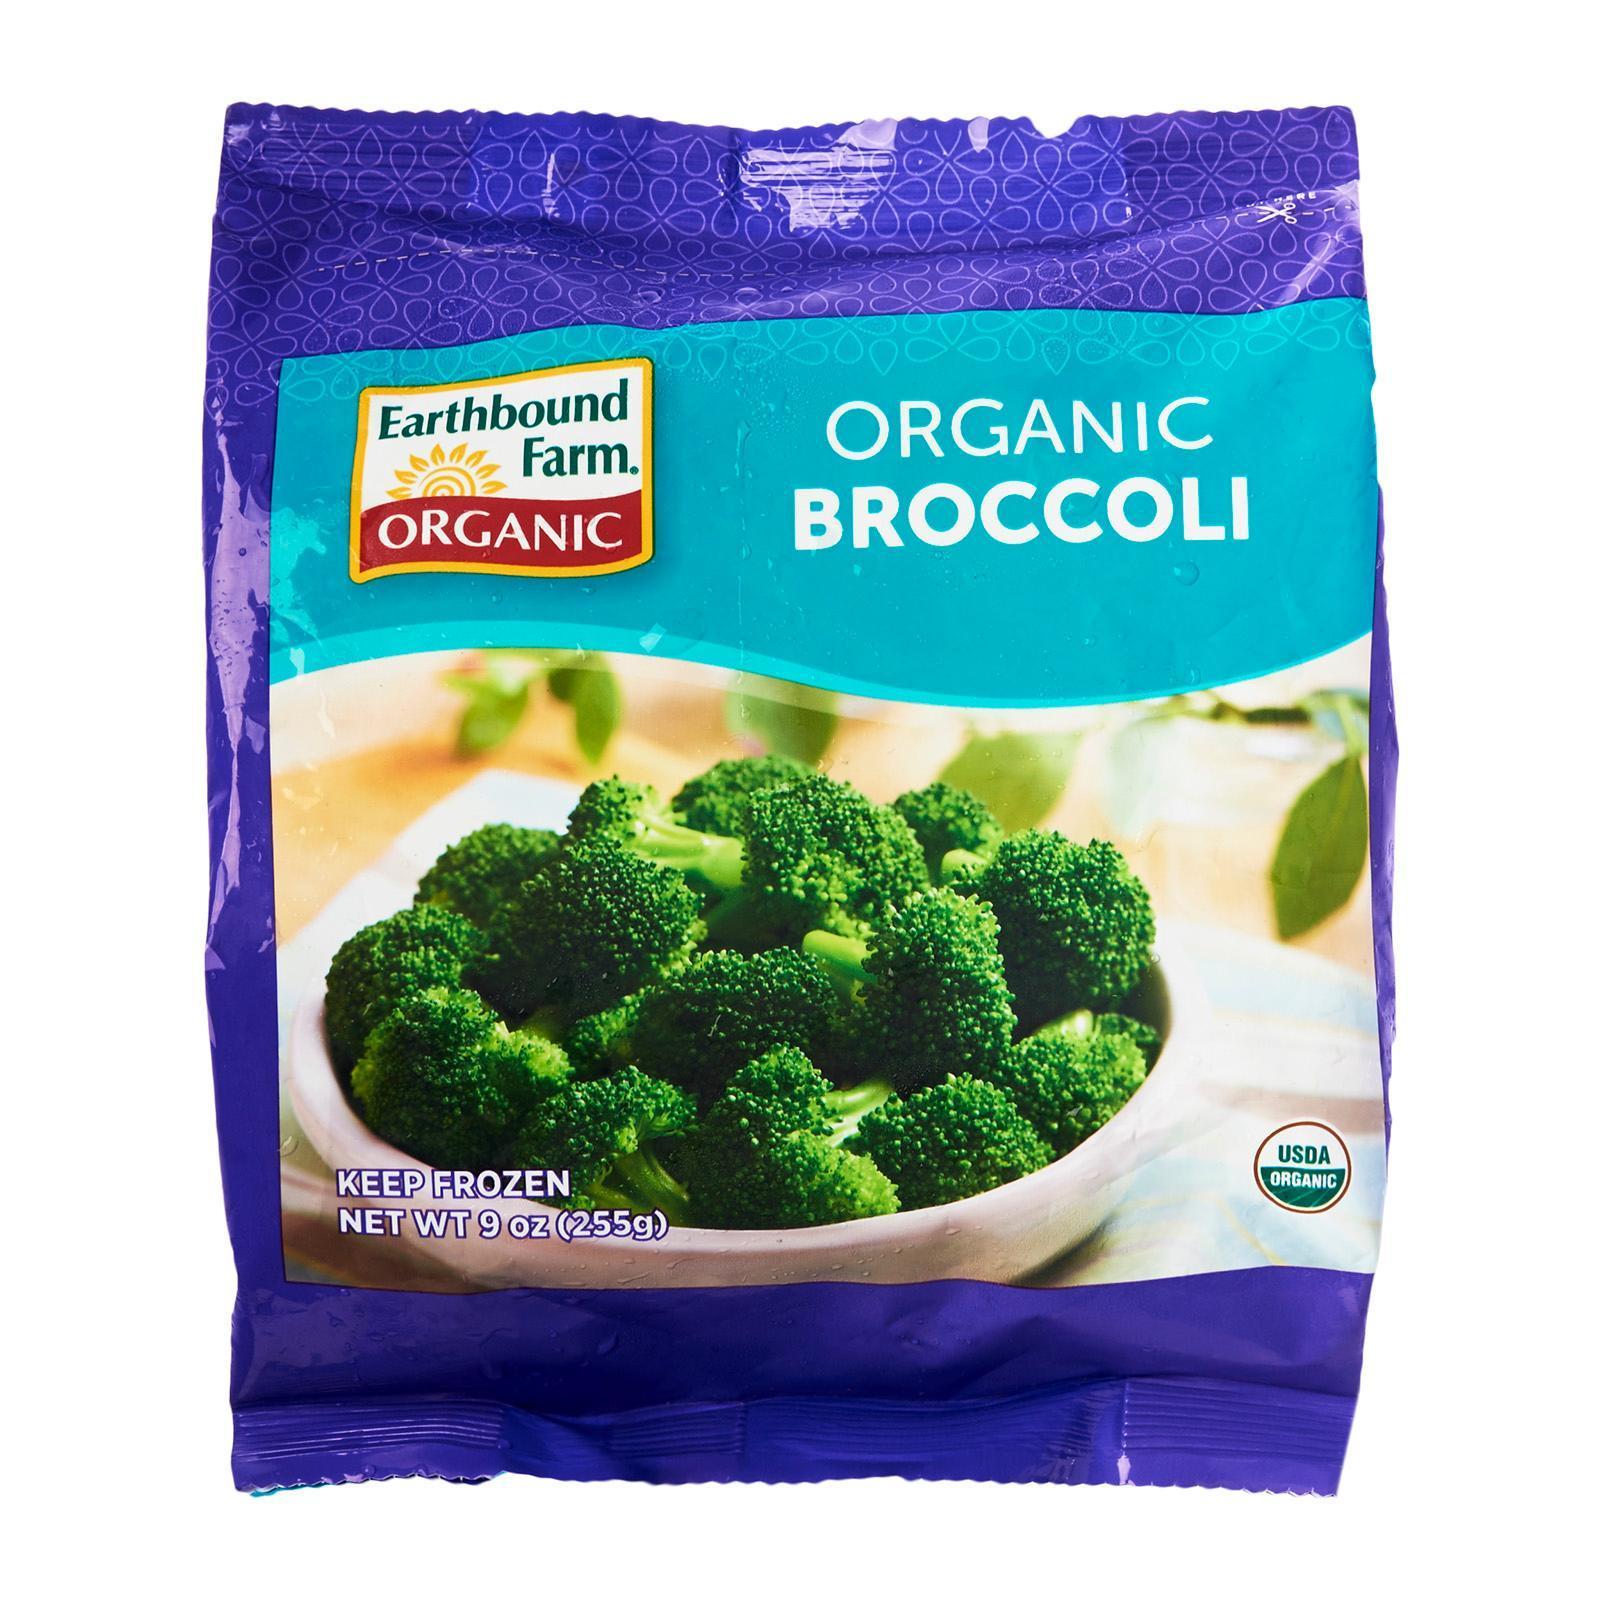 Earth Bound Farms Organic Broccoli - Frozen By Redmart.